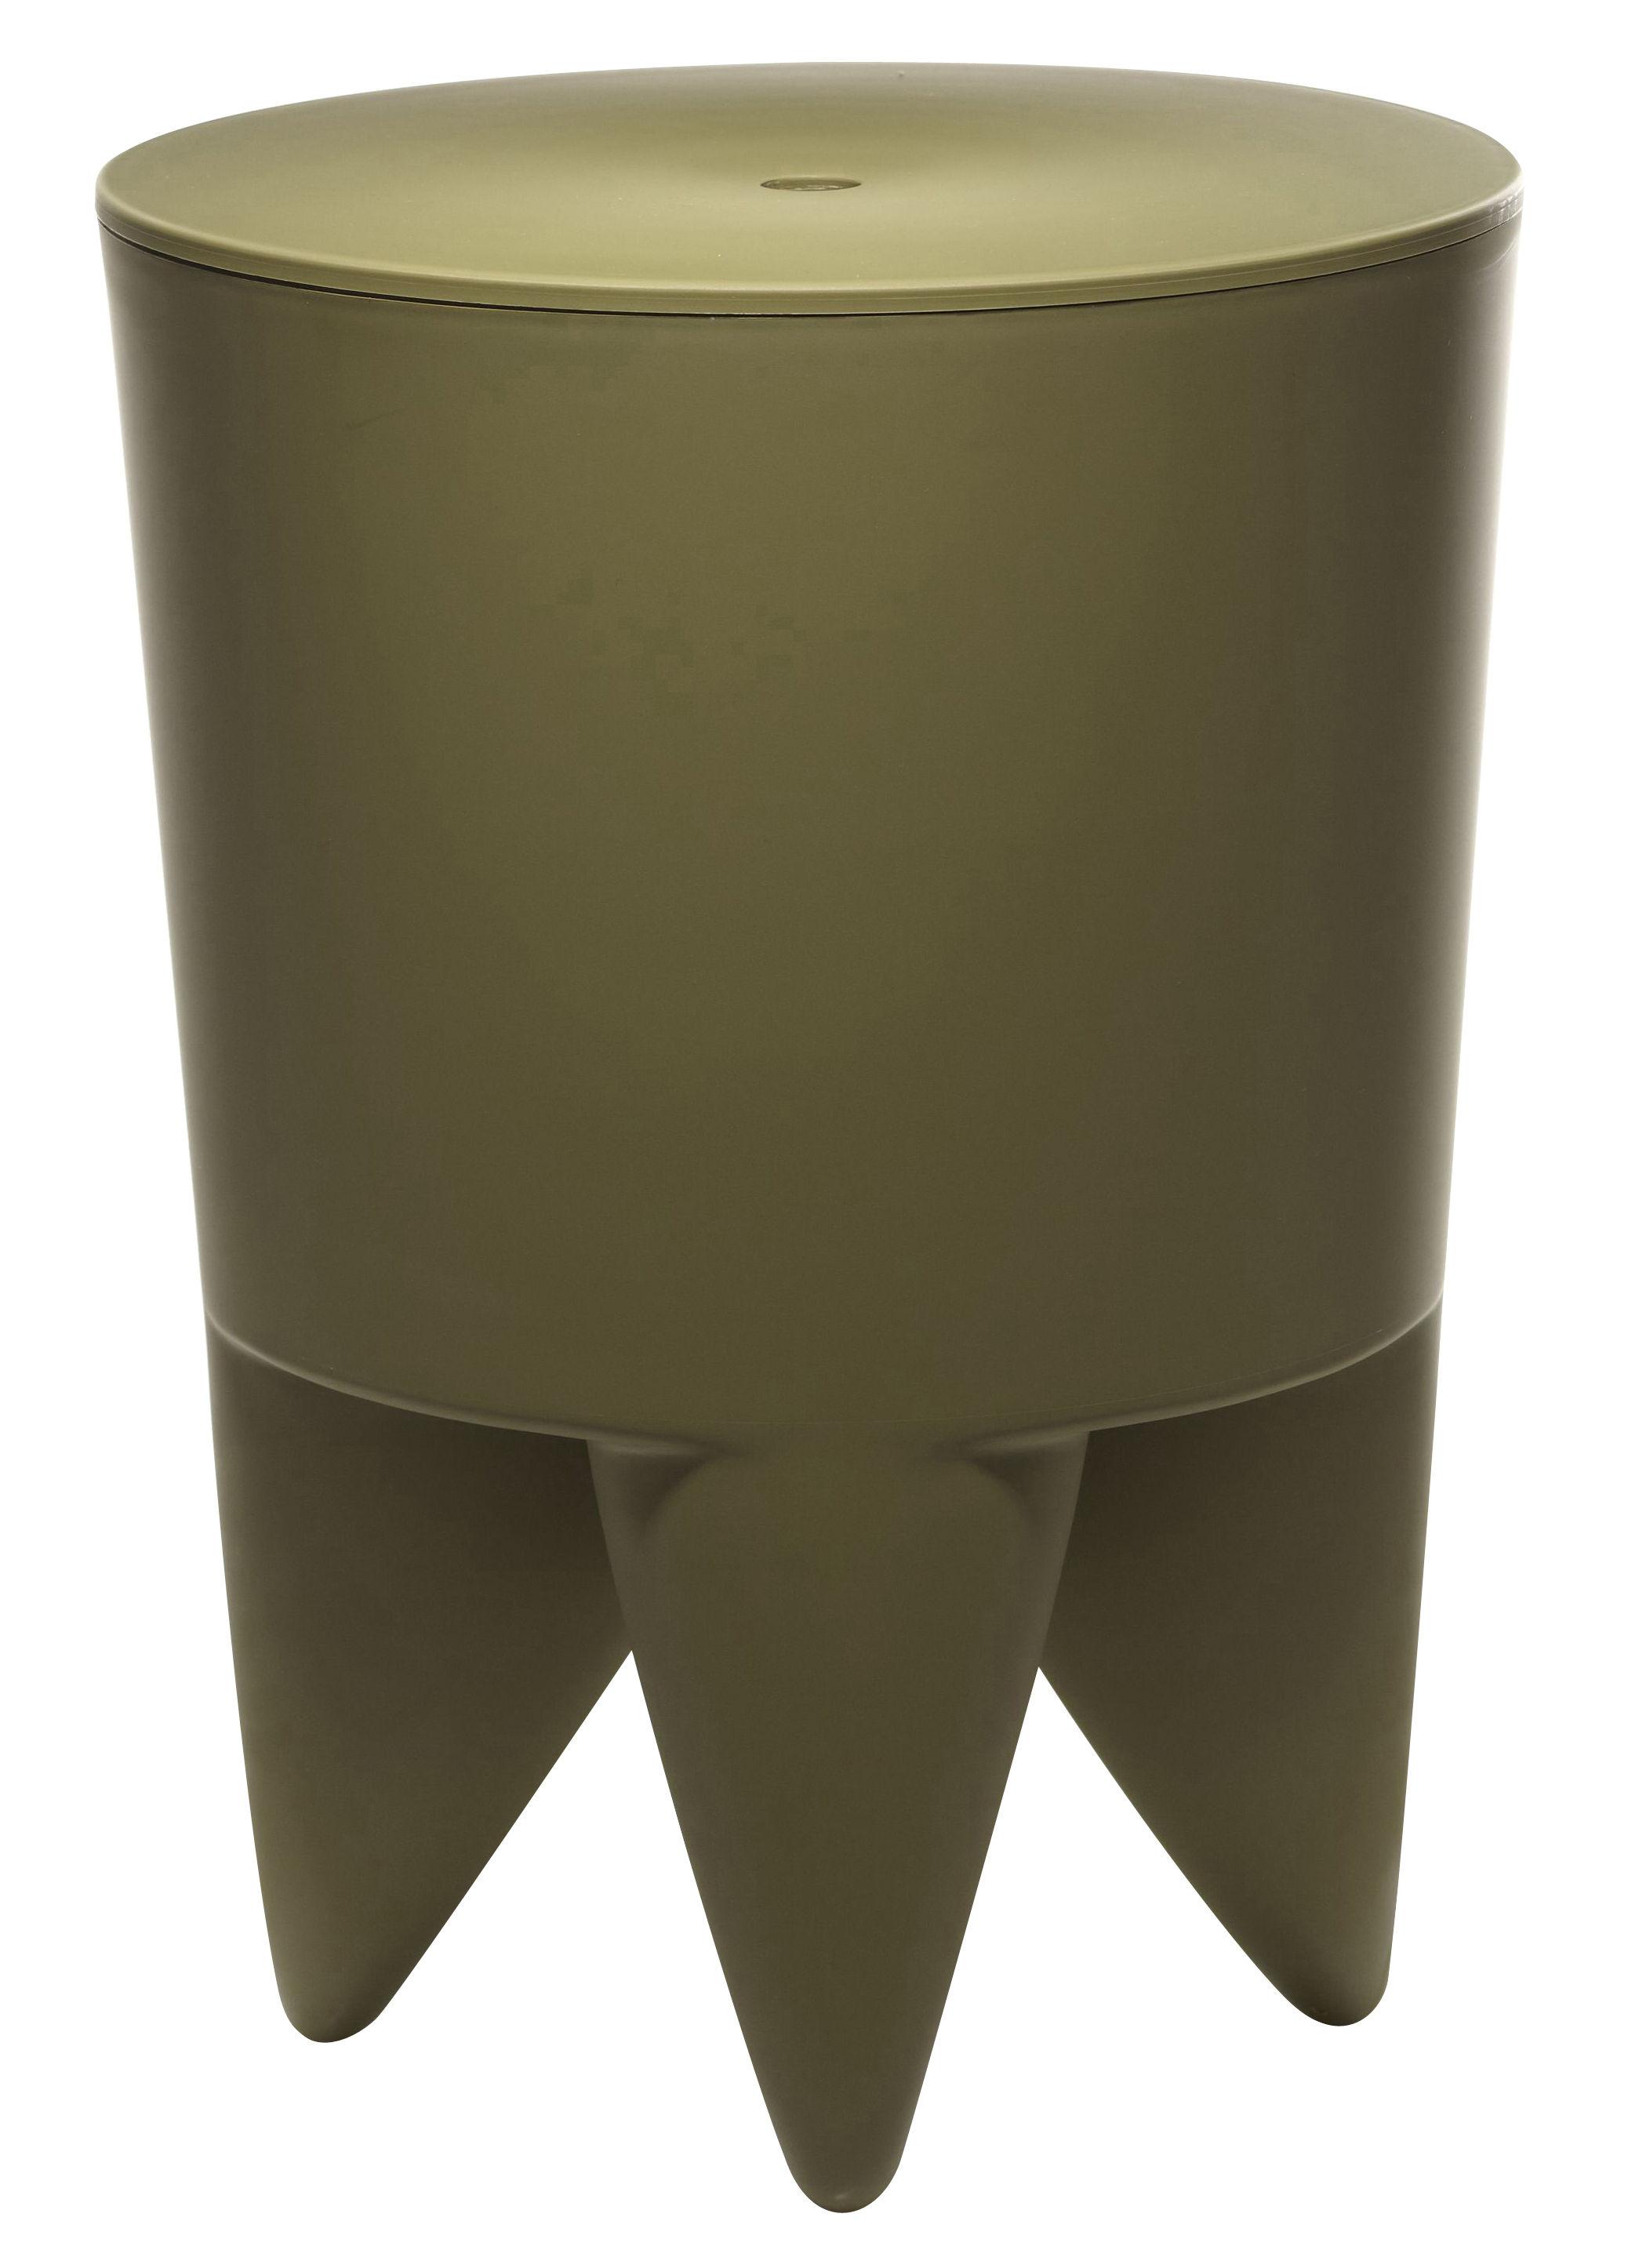 new bubu 1er stool kaki by xo made in design uk. Black Bedroom Furniture Sets. Home Design Ideas